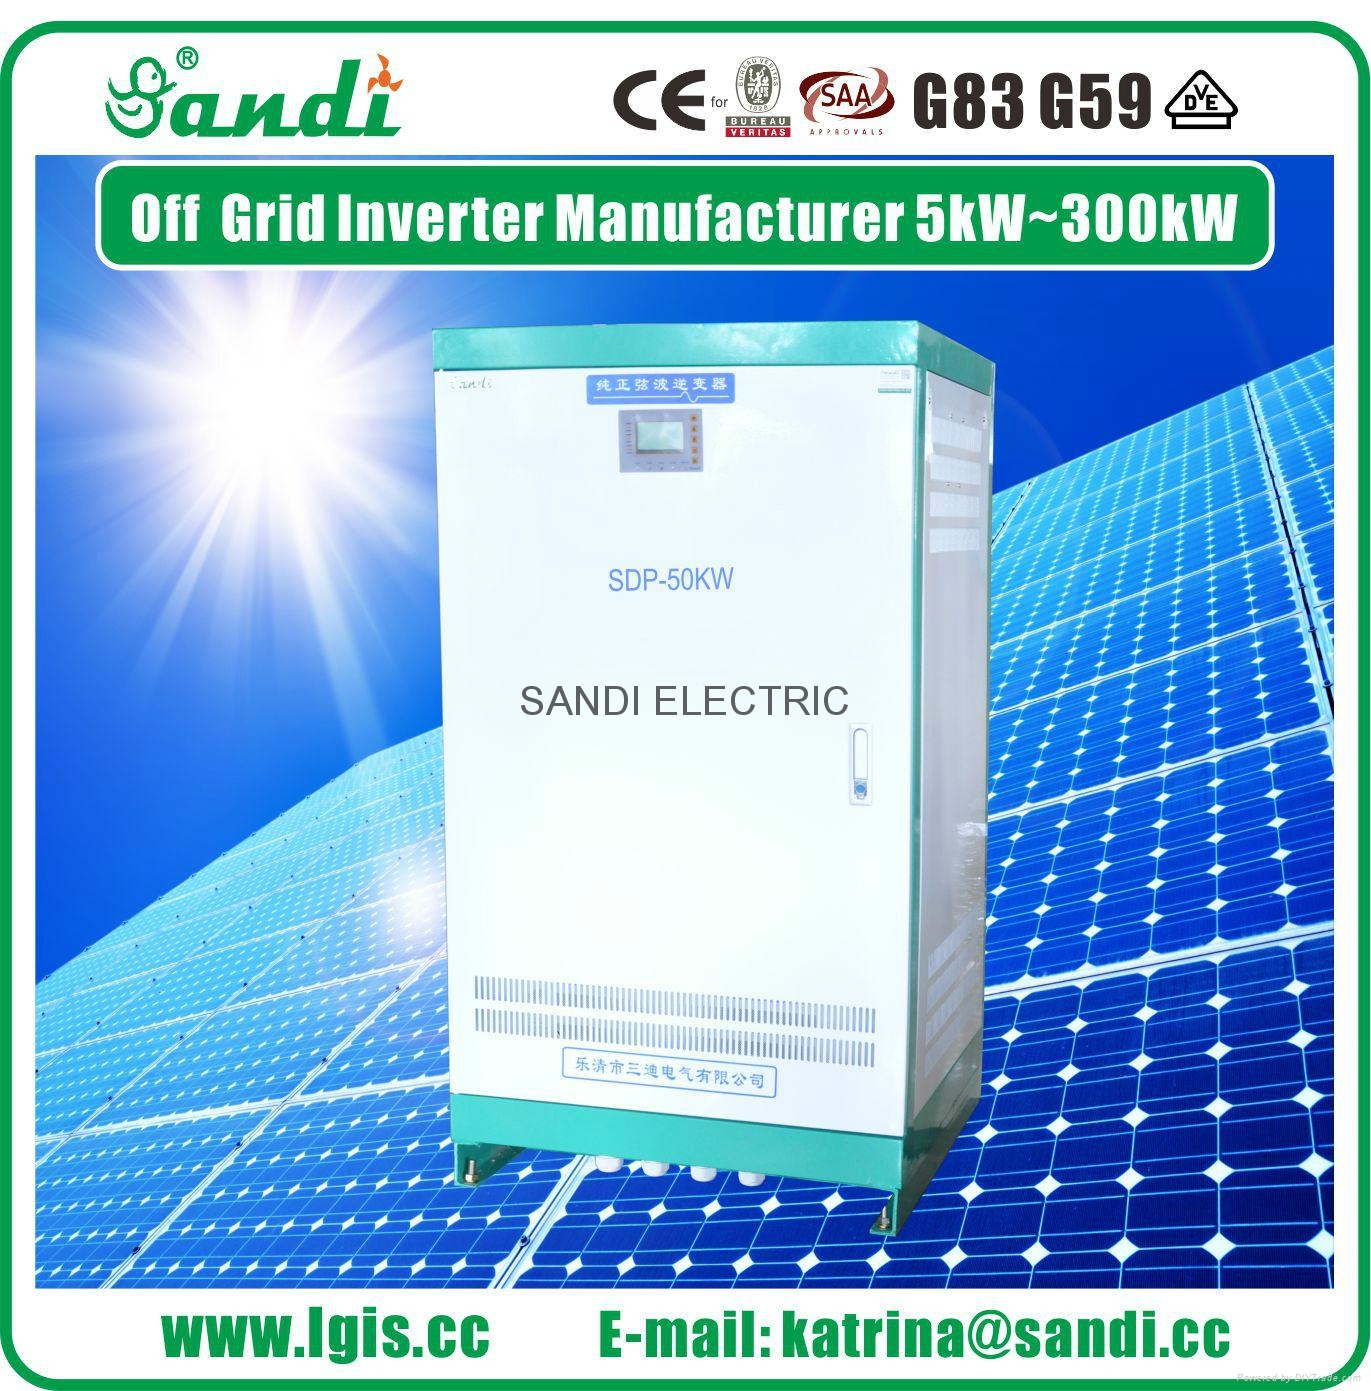 SDP-50KW Off Grid Solar Inverter